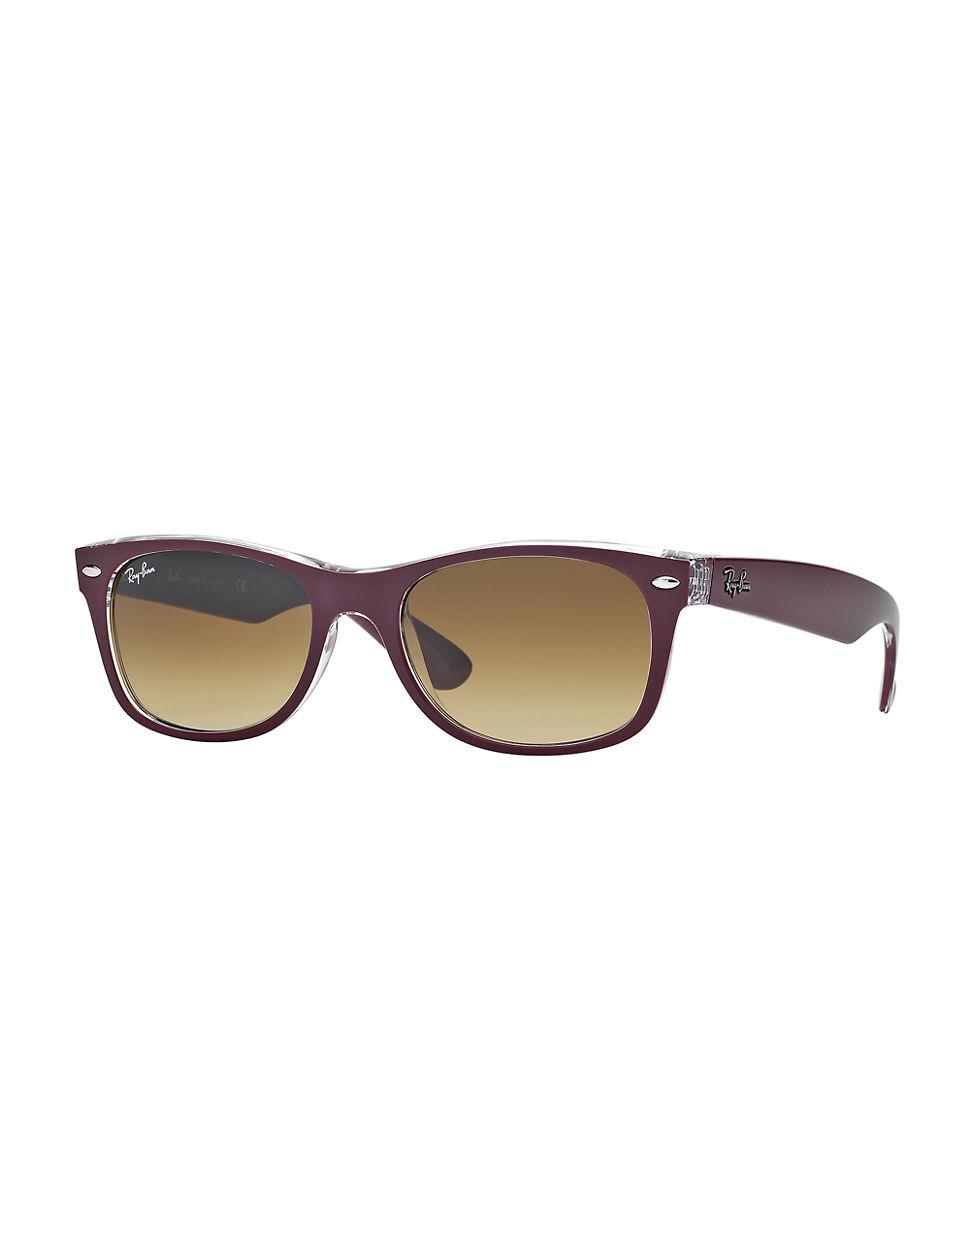 ray ban 55mm new wayfarer sunglasses in purple lyst. Black Bedroom Furniture Sets. Home Design Ideas